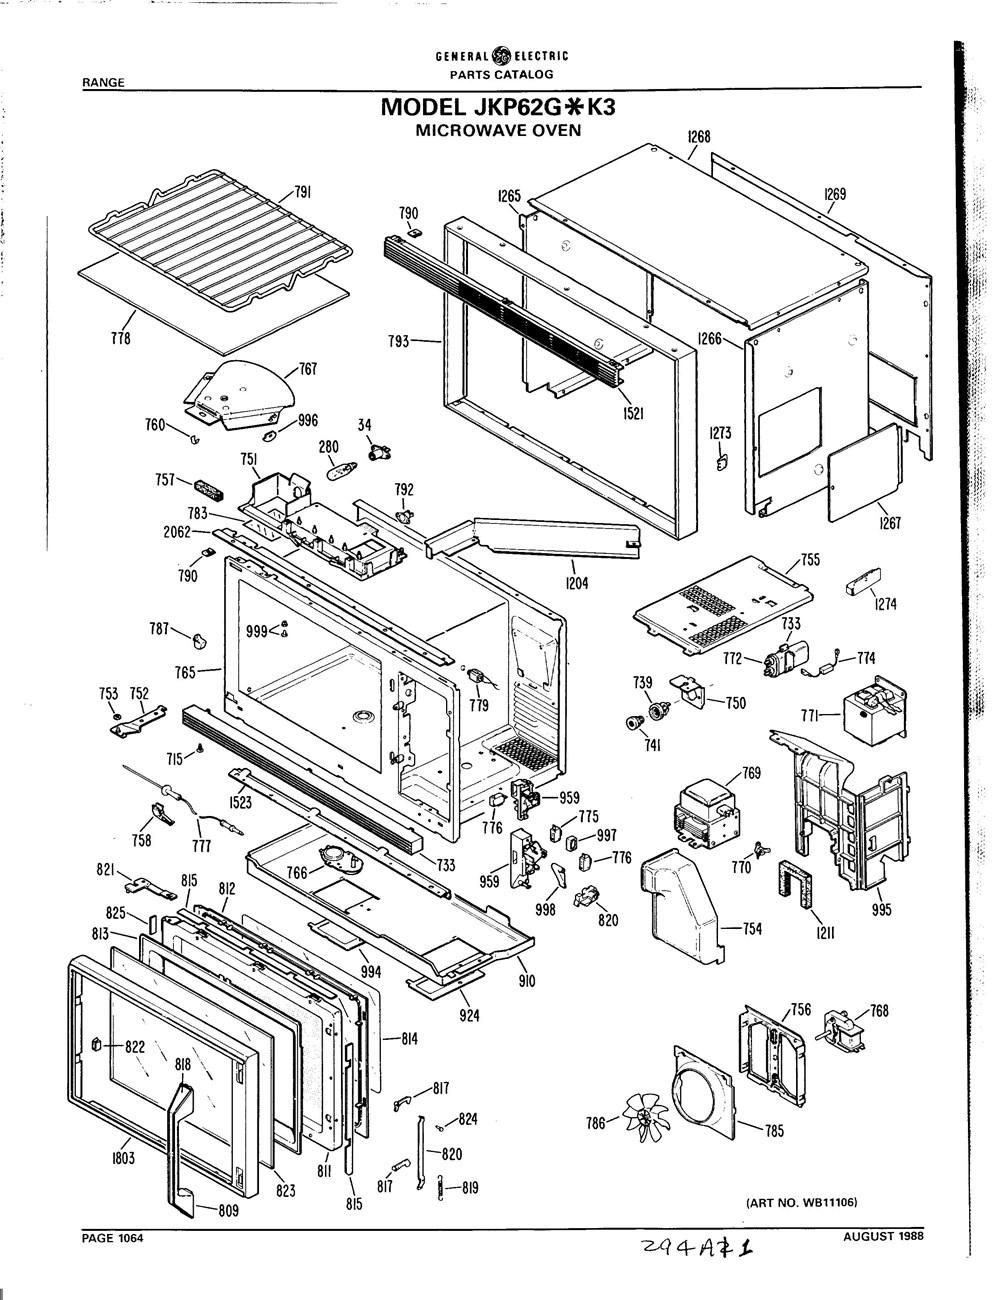 refrigerator compressor wiring diagram images wiring diagram kenmore microwave image wiring diagram